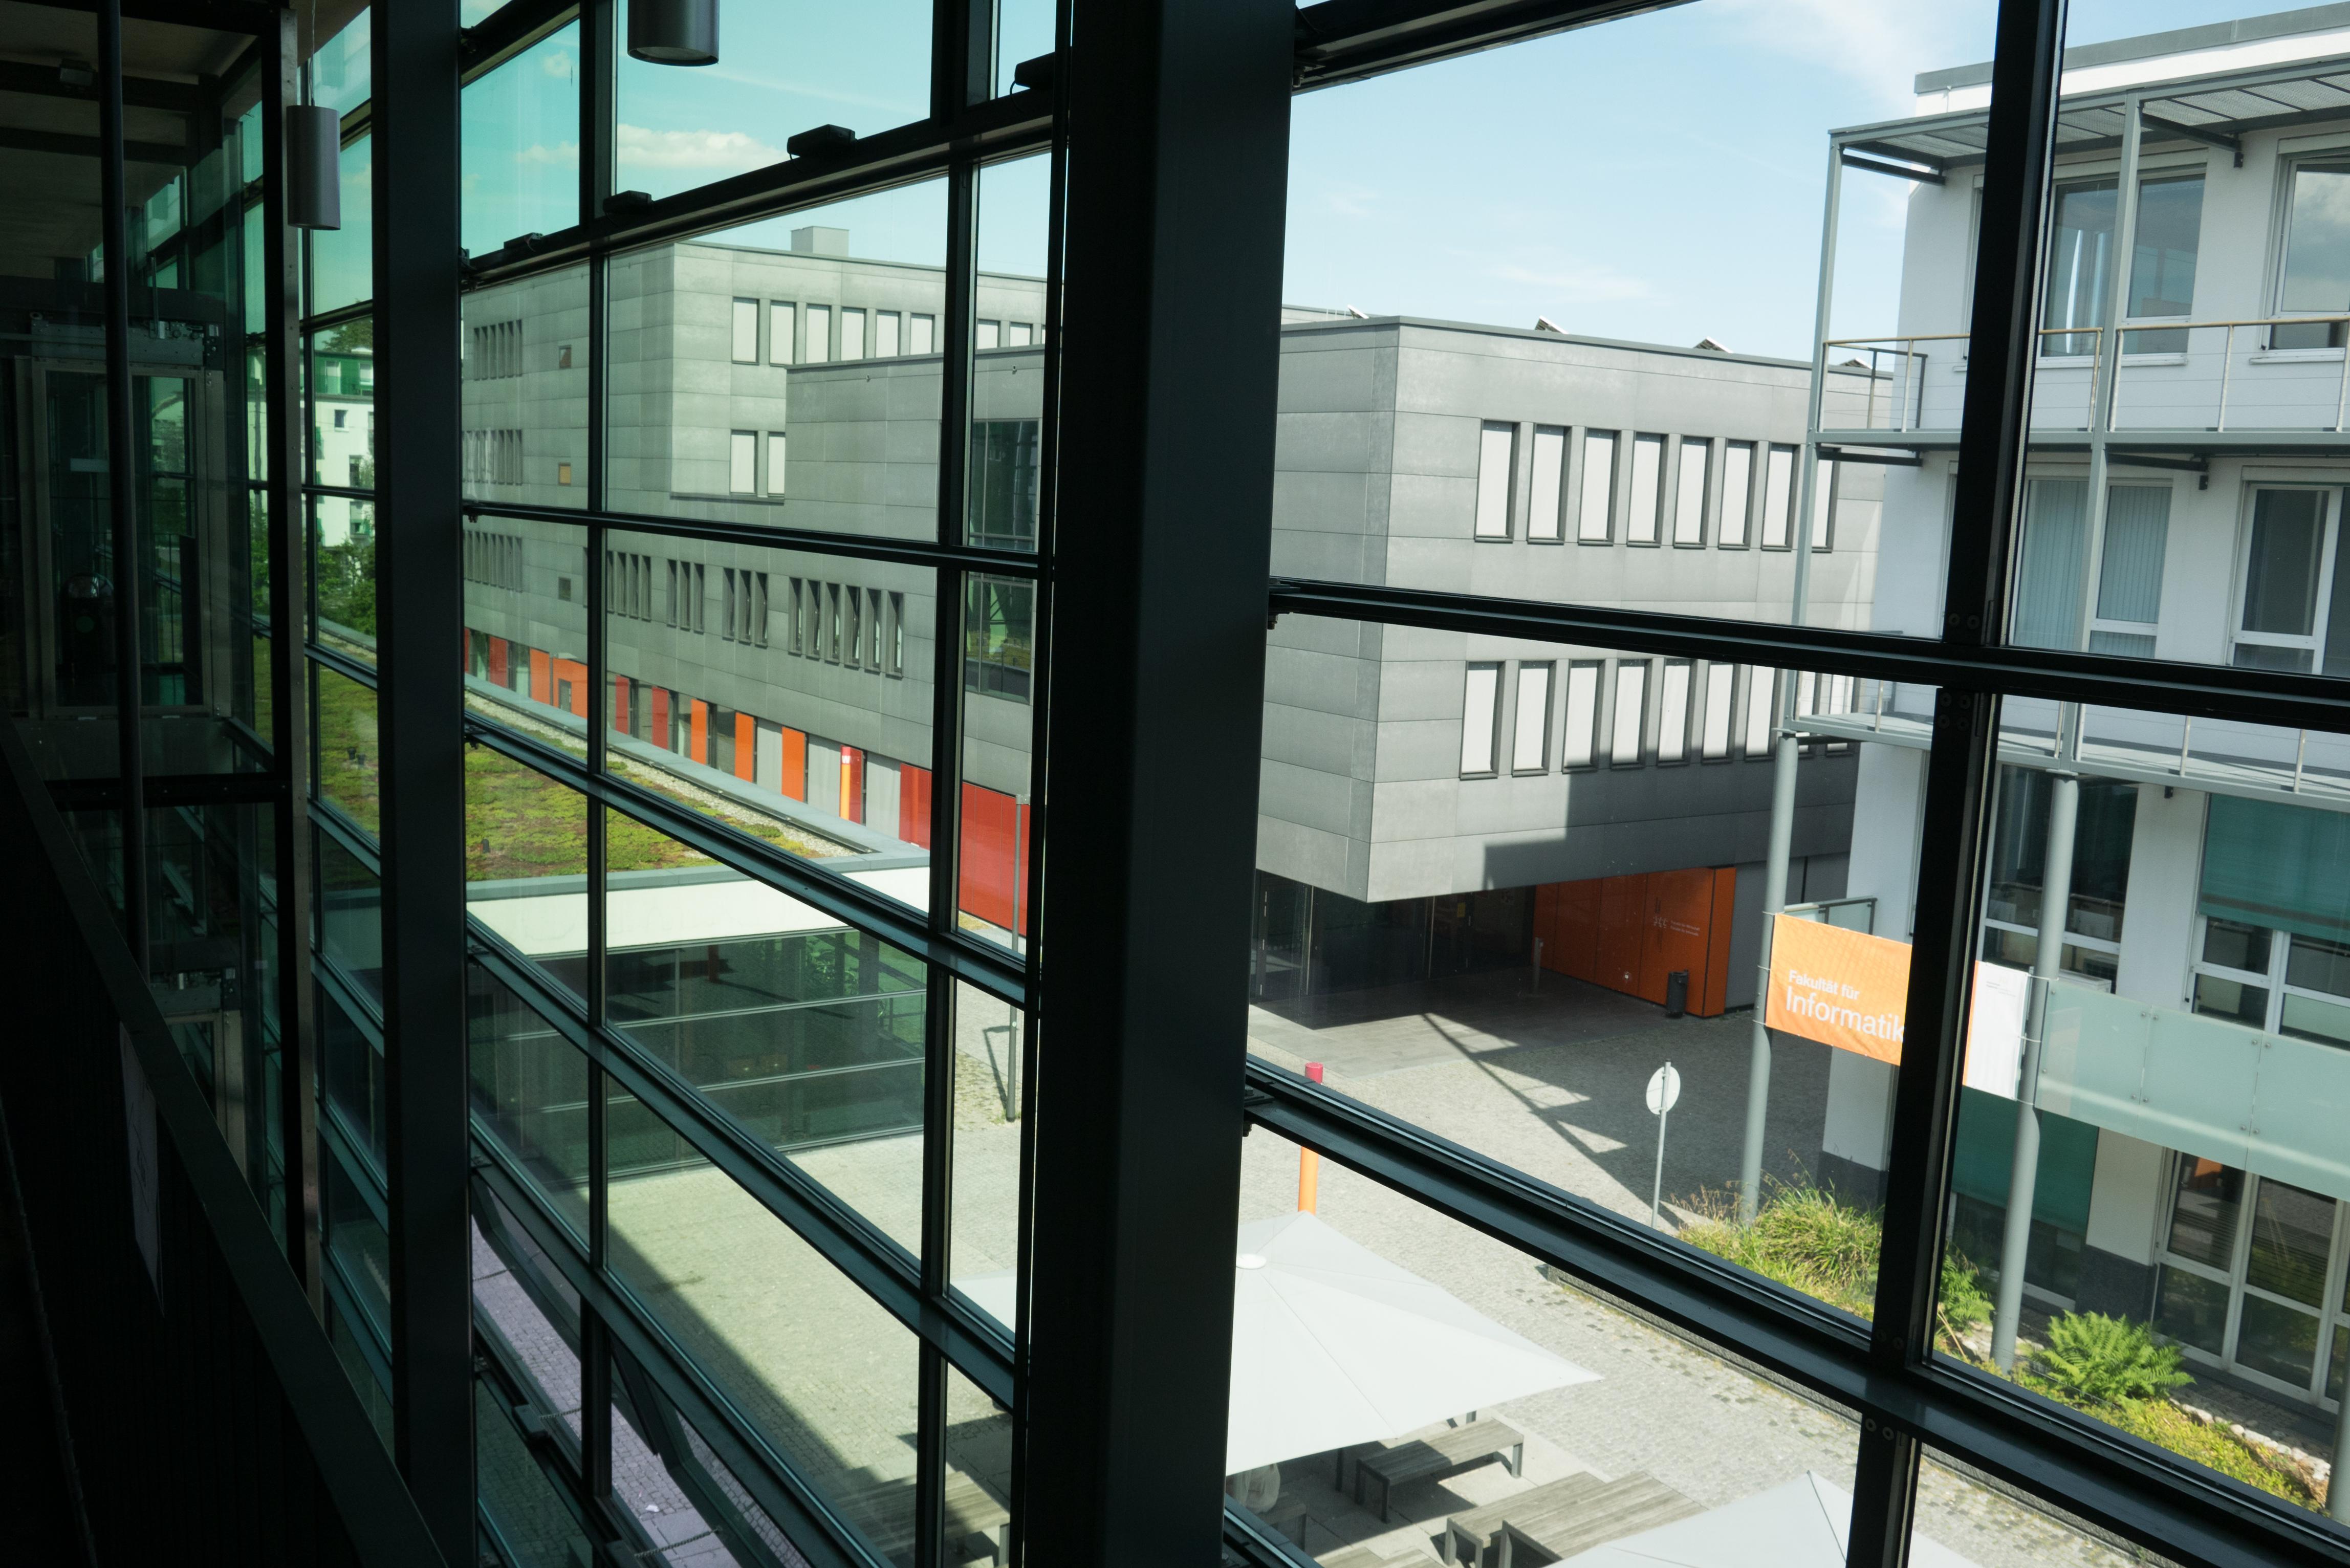 File Hs Augsburg L Bau Blick Auf W Bau Jpg Wikimedia Commons